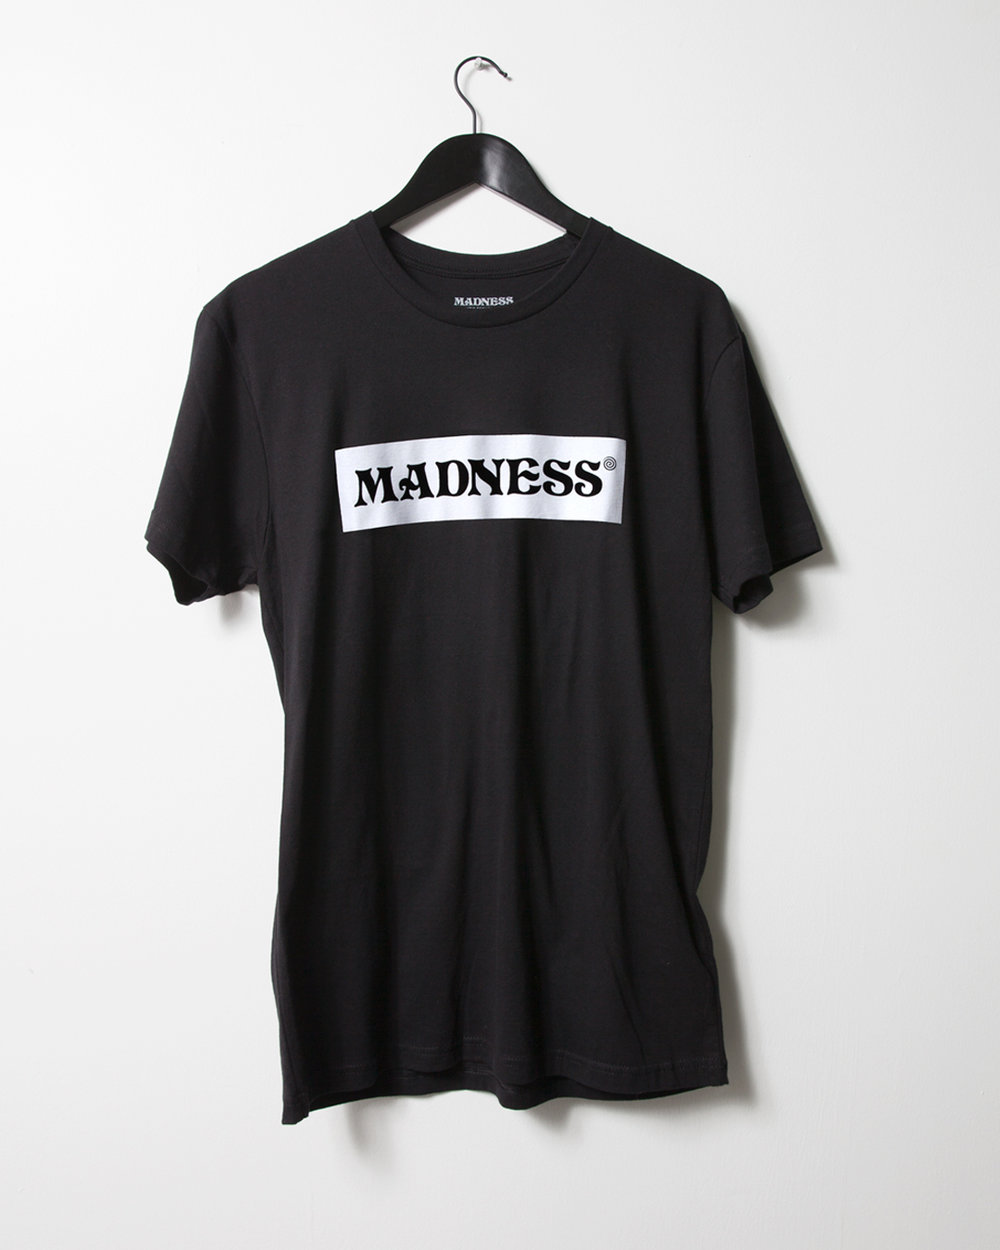 madness-skateboards-BAR-BLACK-FRONT-1350.jpg